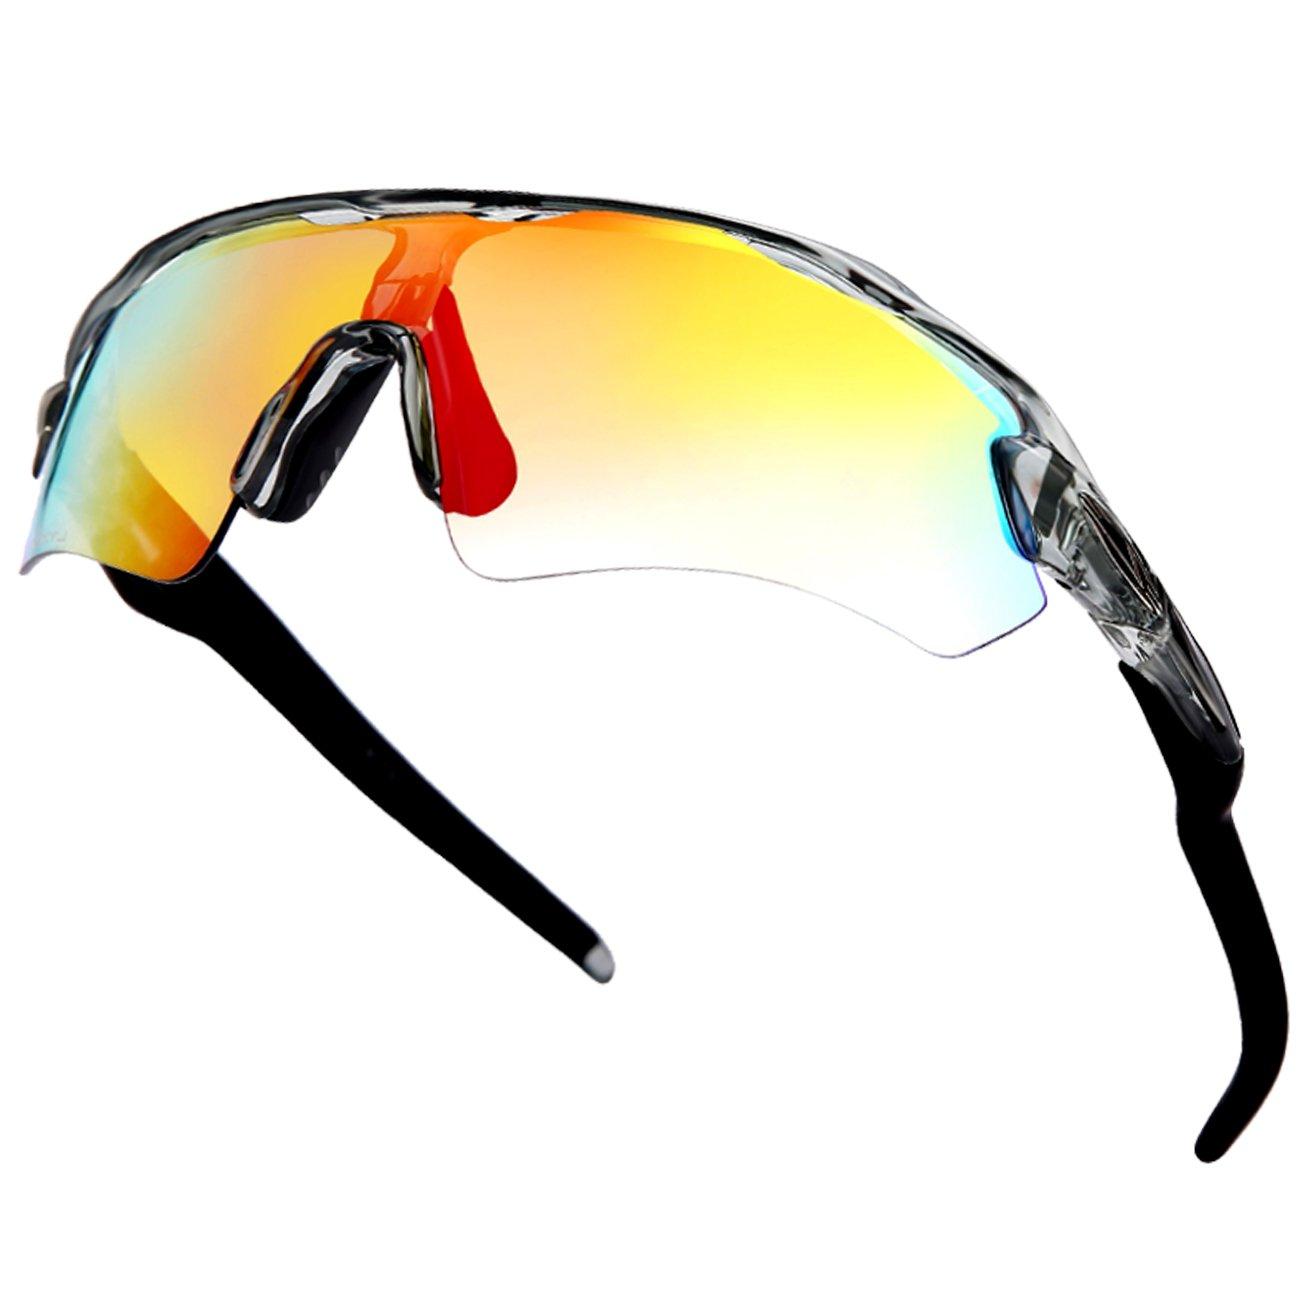 cabfea6014 Amazon.com   Cycling Glasses Wheel UP Photochromic Anti-UV400  Explosion-Proof PC Intelligence Lenses Aerodynamics MTB Sports Bike  Sunglasses Eyewear ...